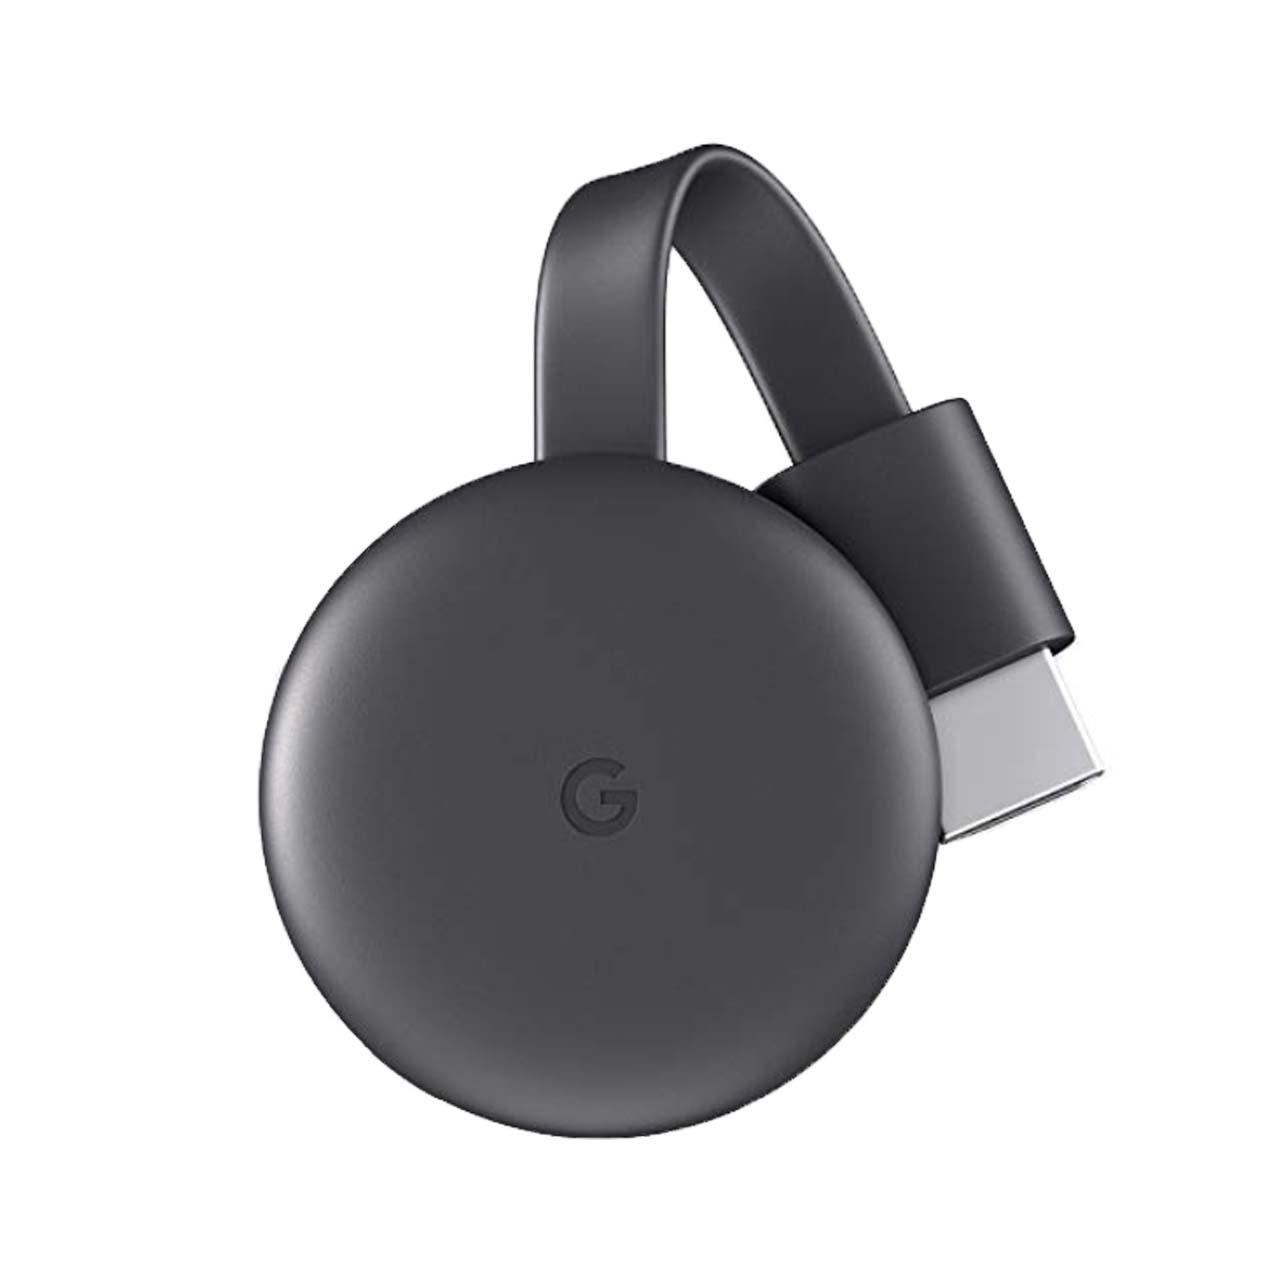 دانگل HDMI گوگل مدل Chromecast - 3rd Generation